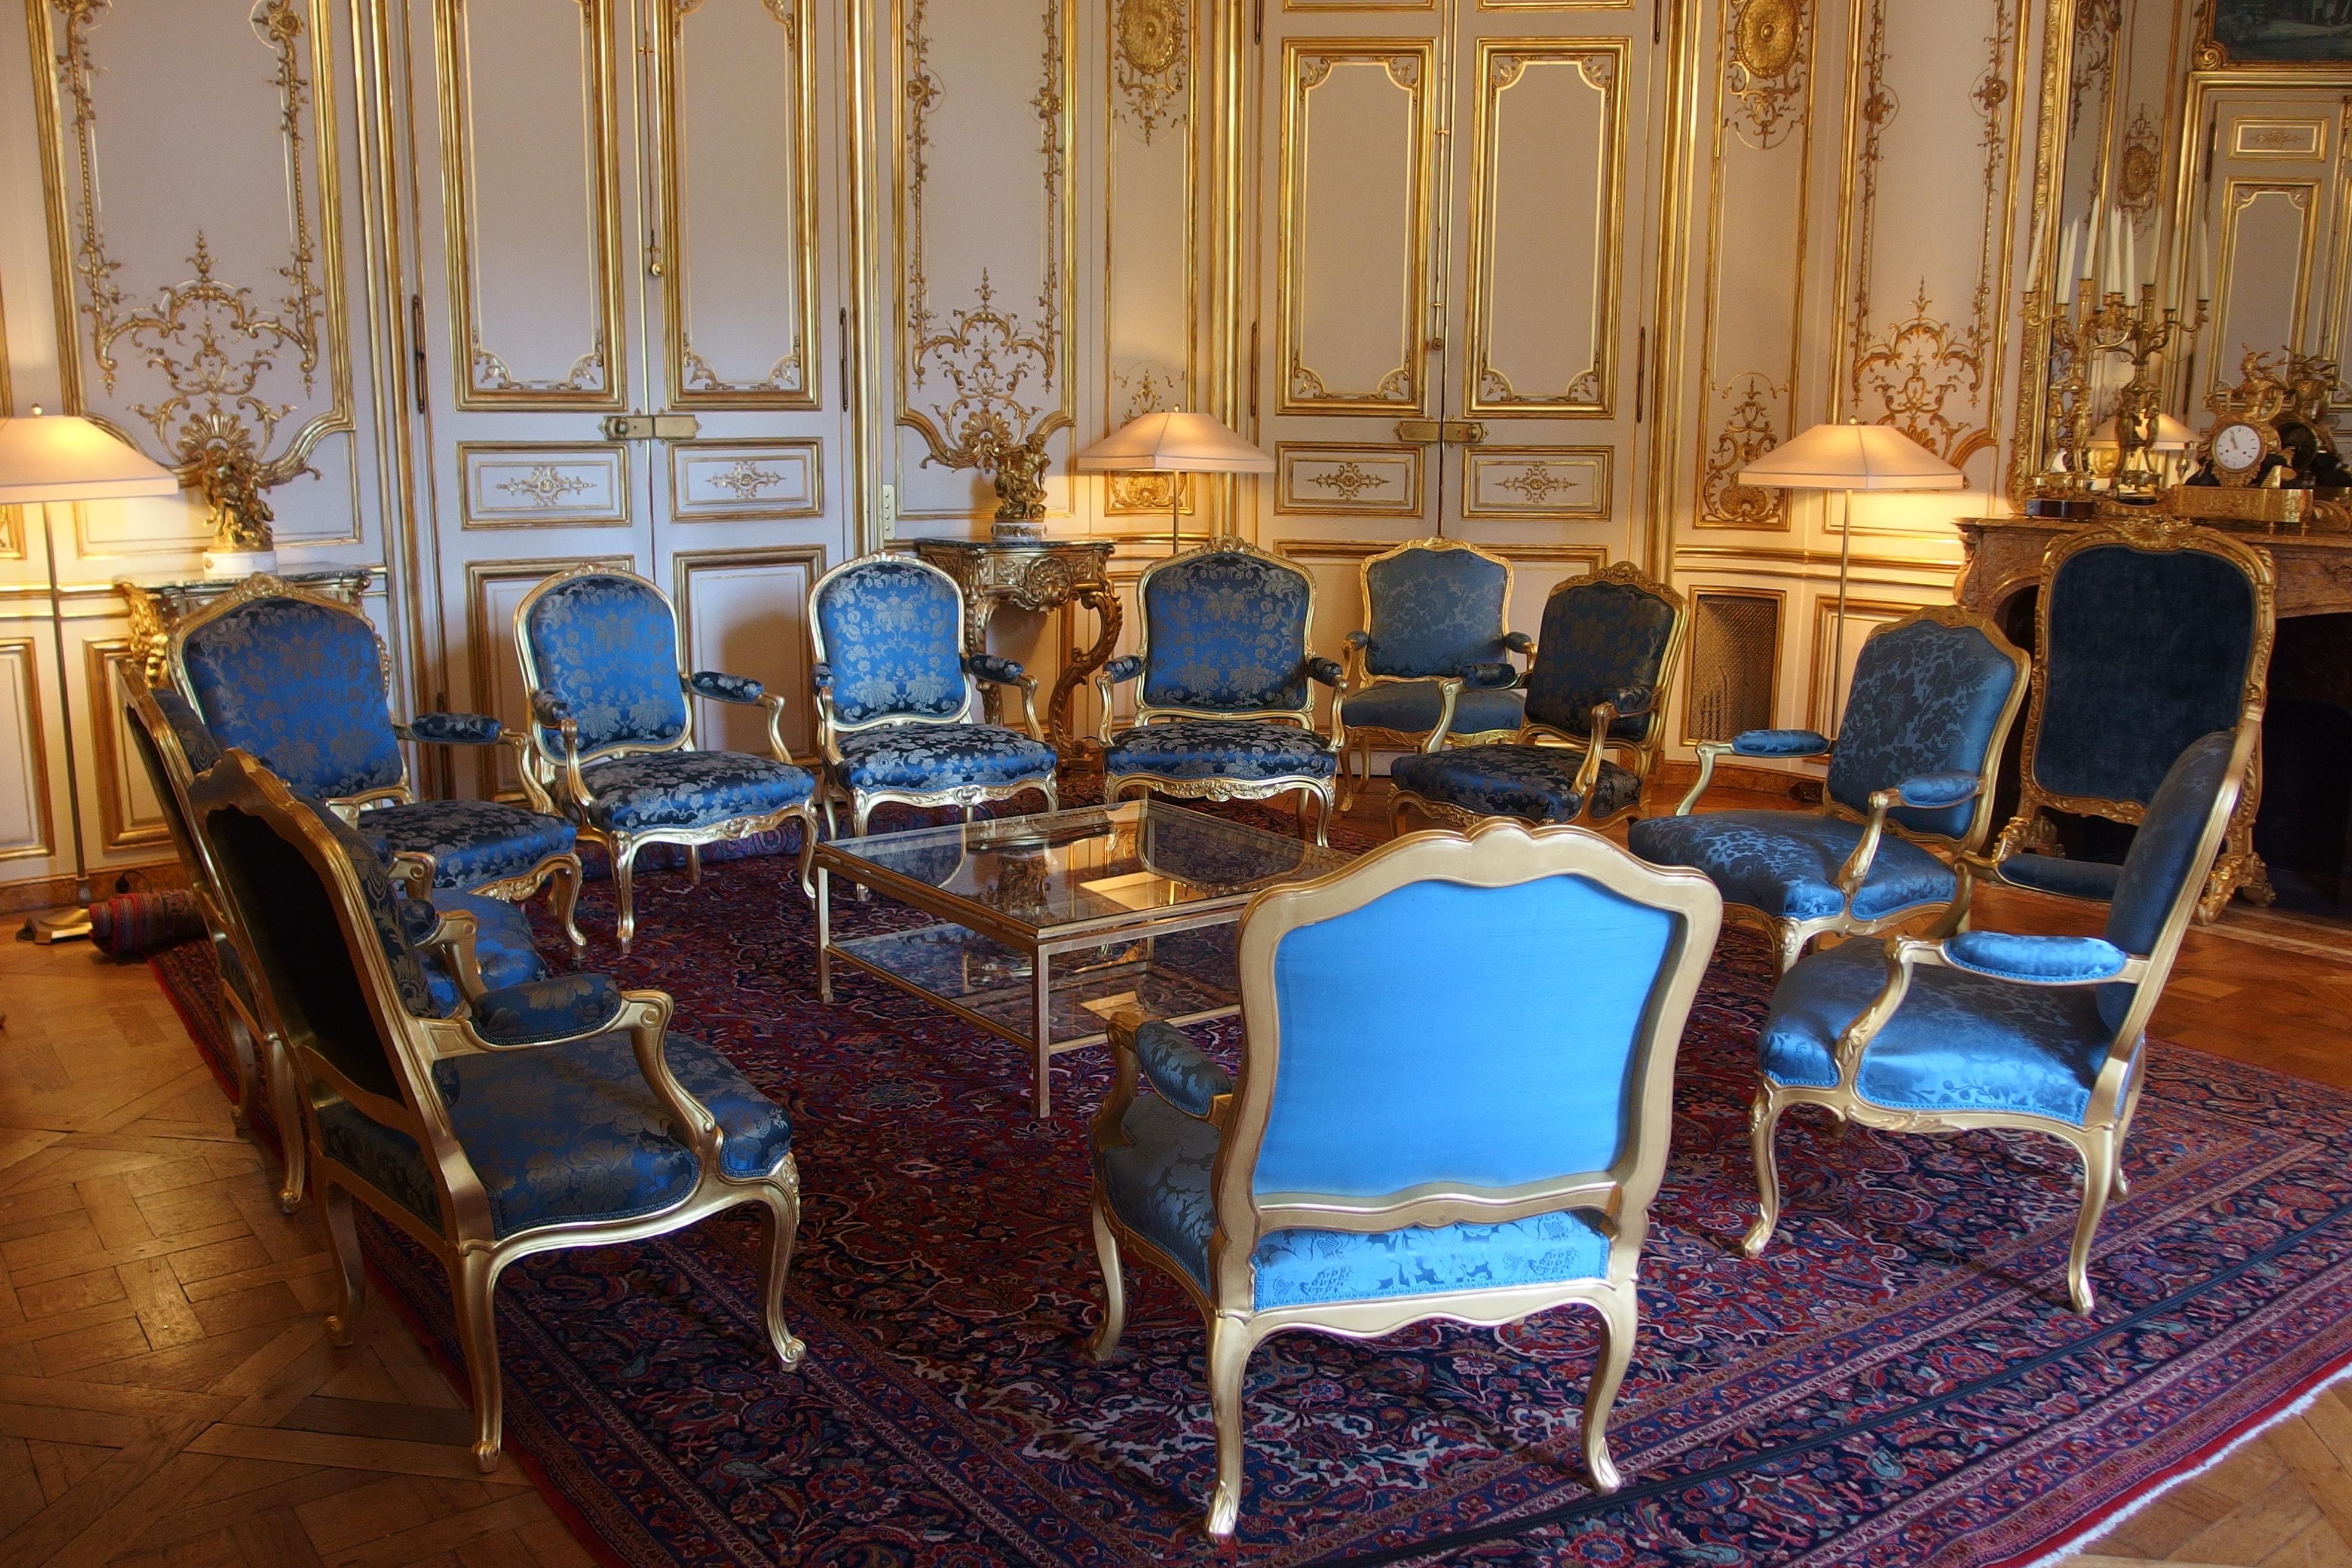 File:Le Salon bleu.JPG - Wikimedia Commons